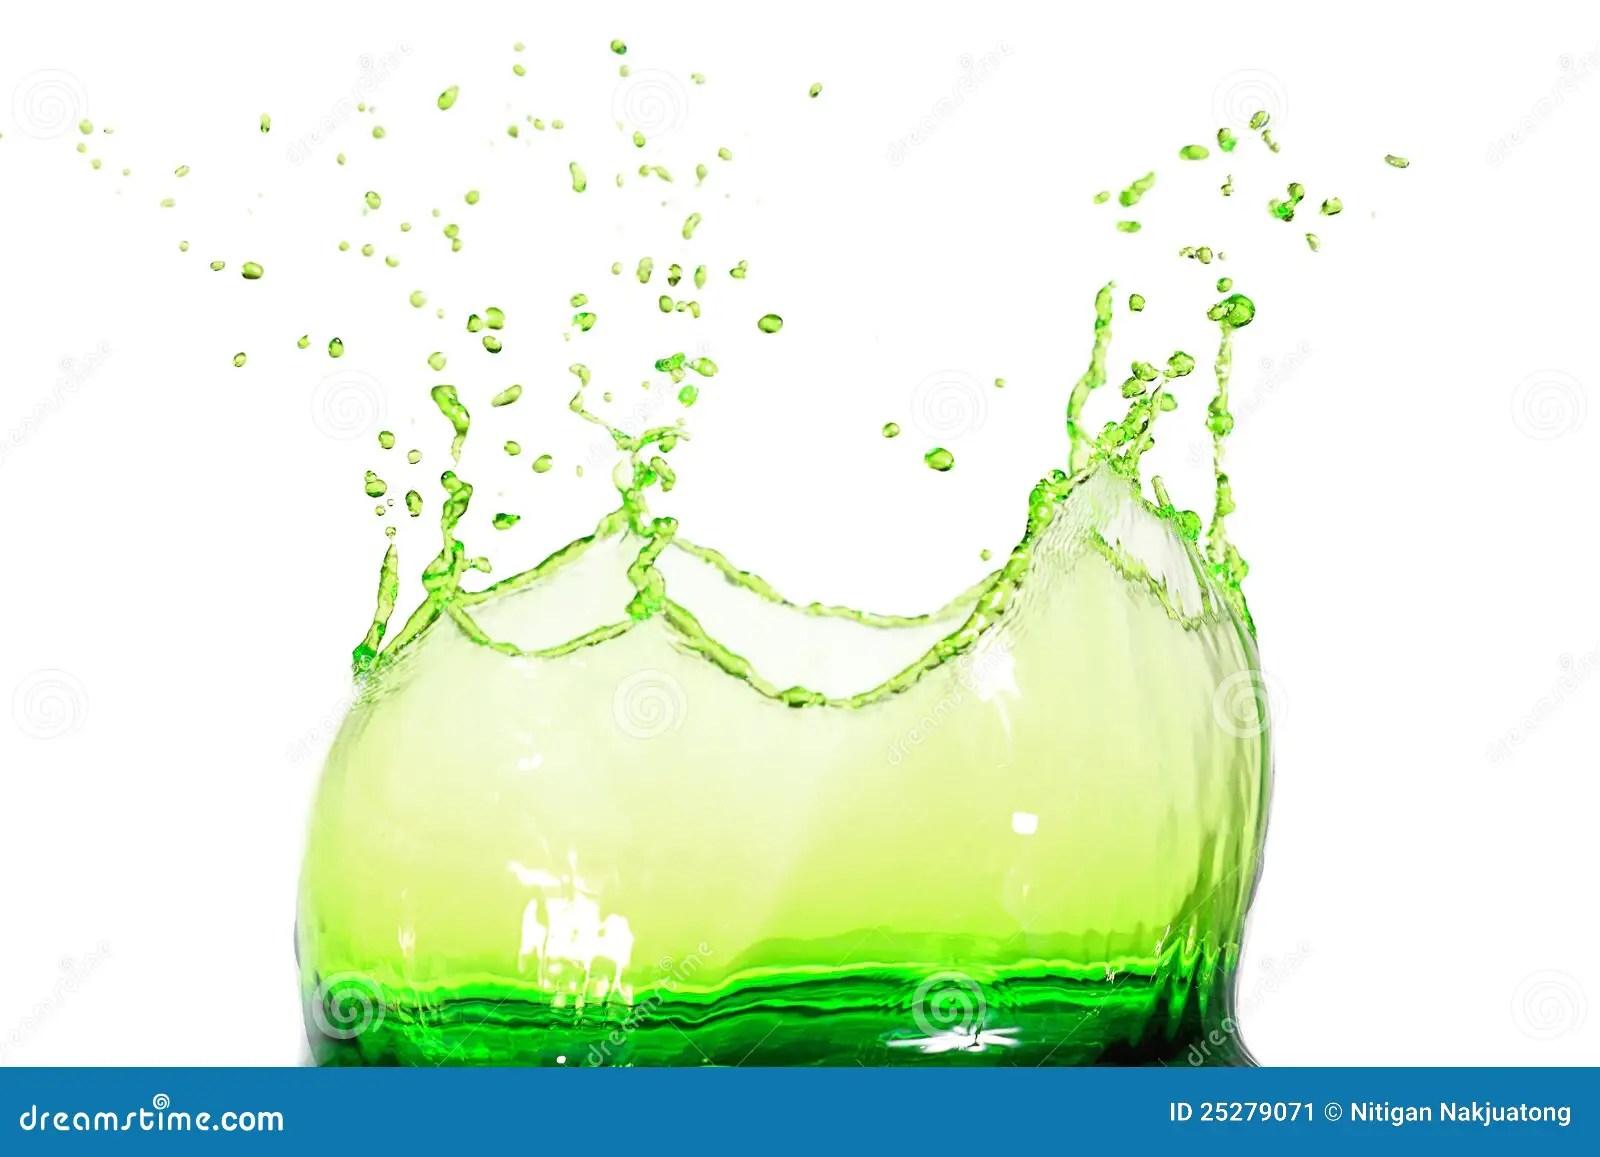 Falling Leaves Wallpaper Free Download Green Water Splash Wallpaper Www Imgkid Com The Image